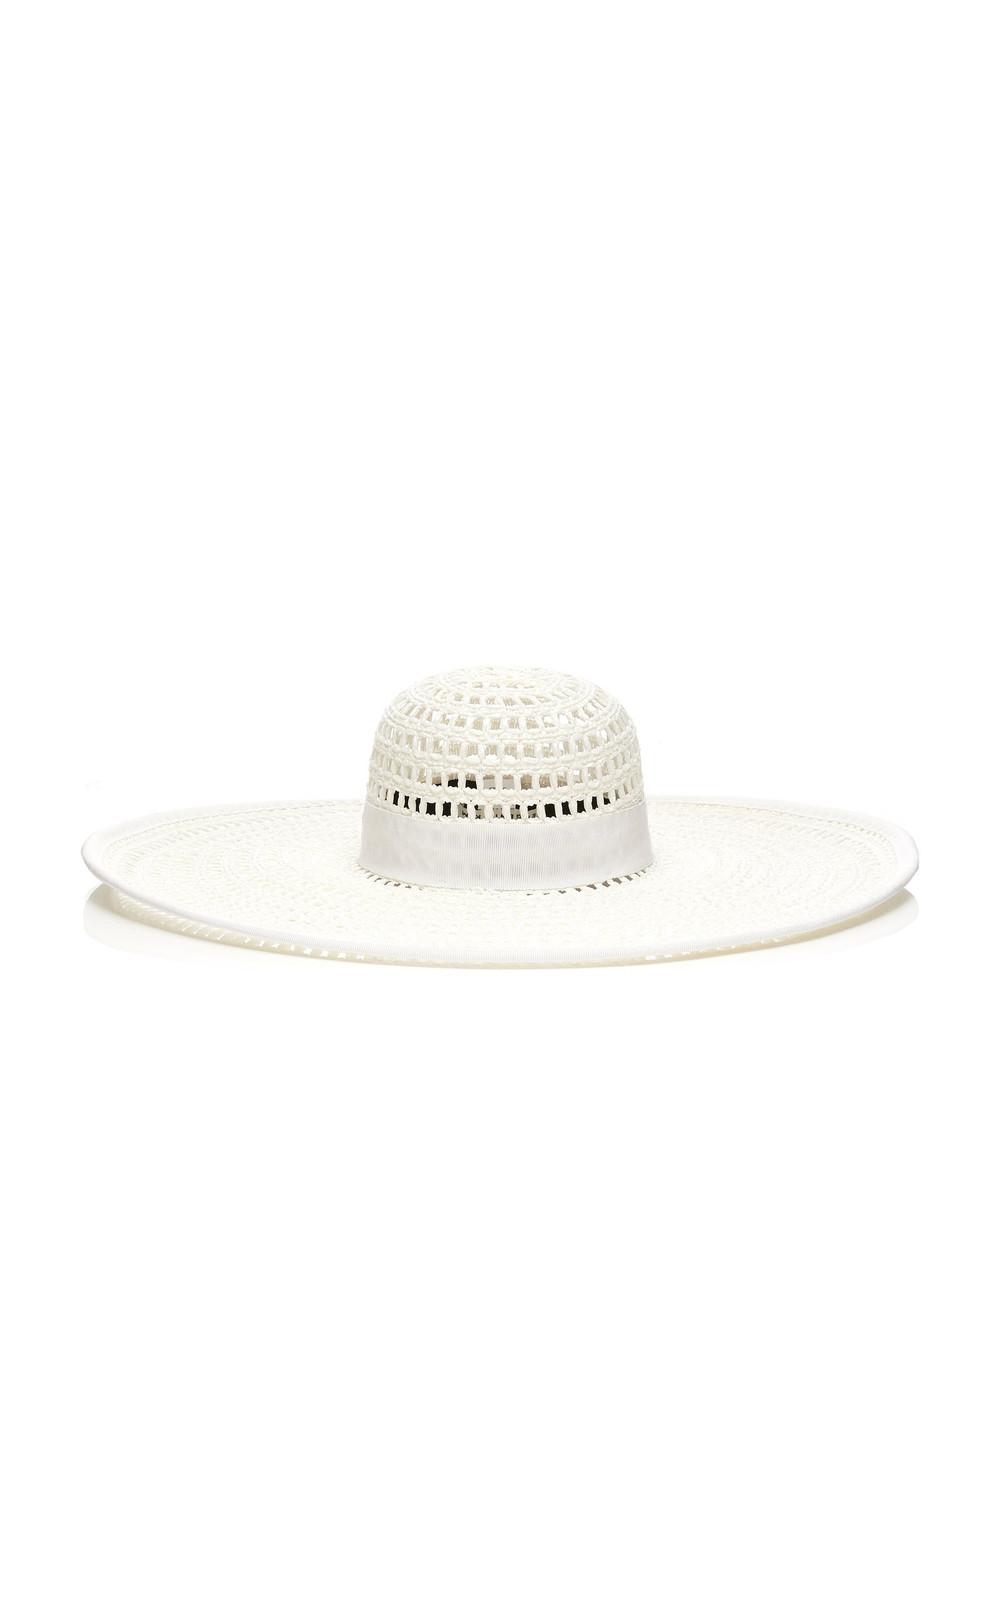 Eugenia Kim Exclusive Wide-Brimmed Straw Sun Hat in white